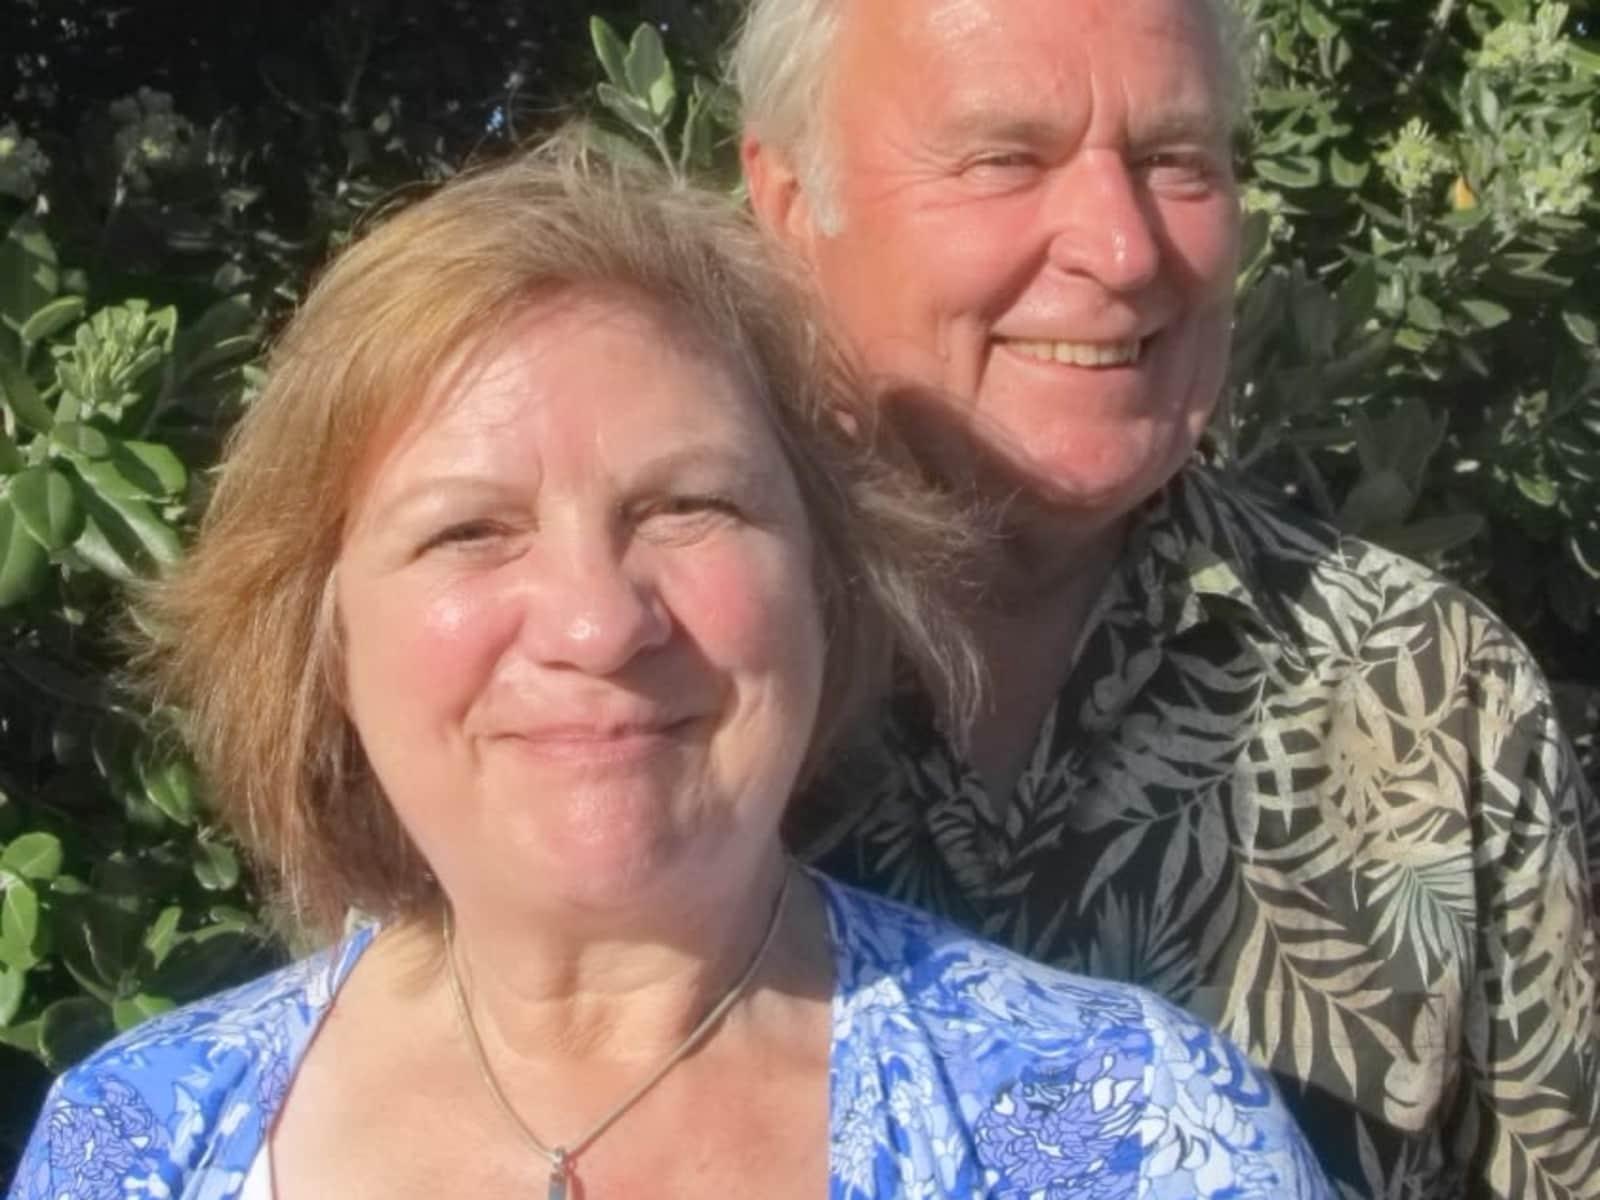 Susan & Ted (john) from Launceston, Tasmania, Australia